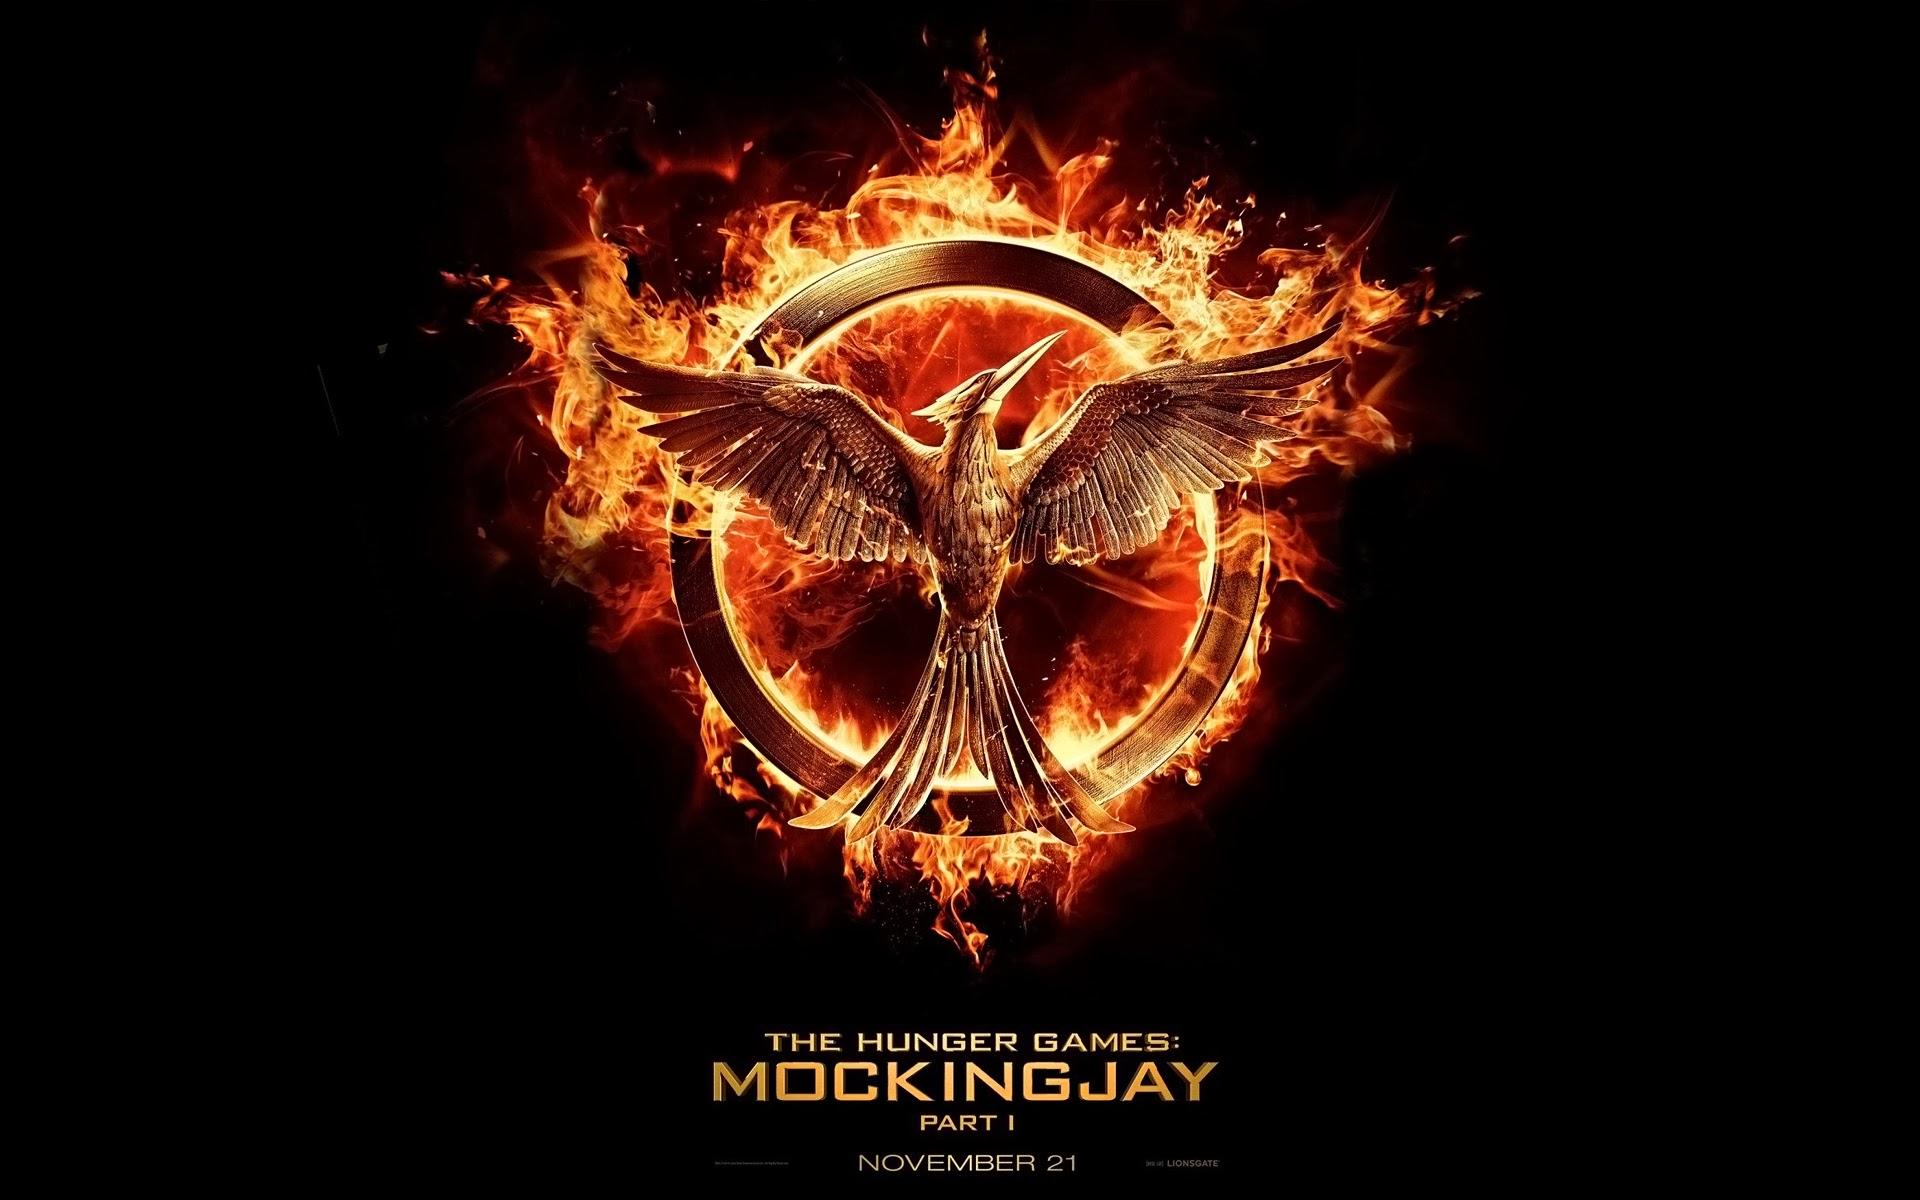 Hunger Games Mockingjay wallpaper   1195035 1920x1200